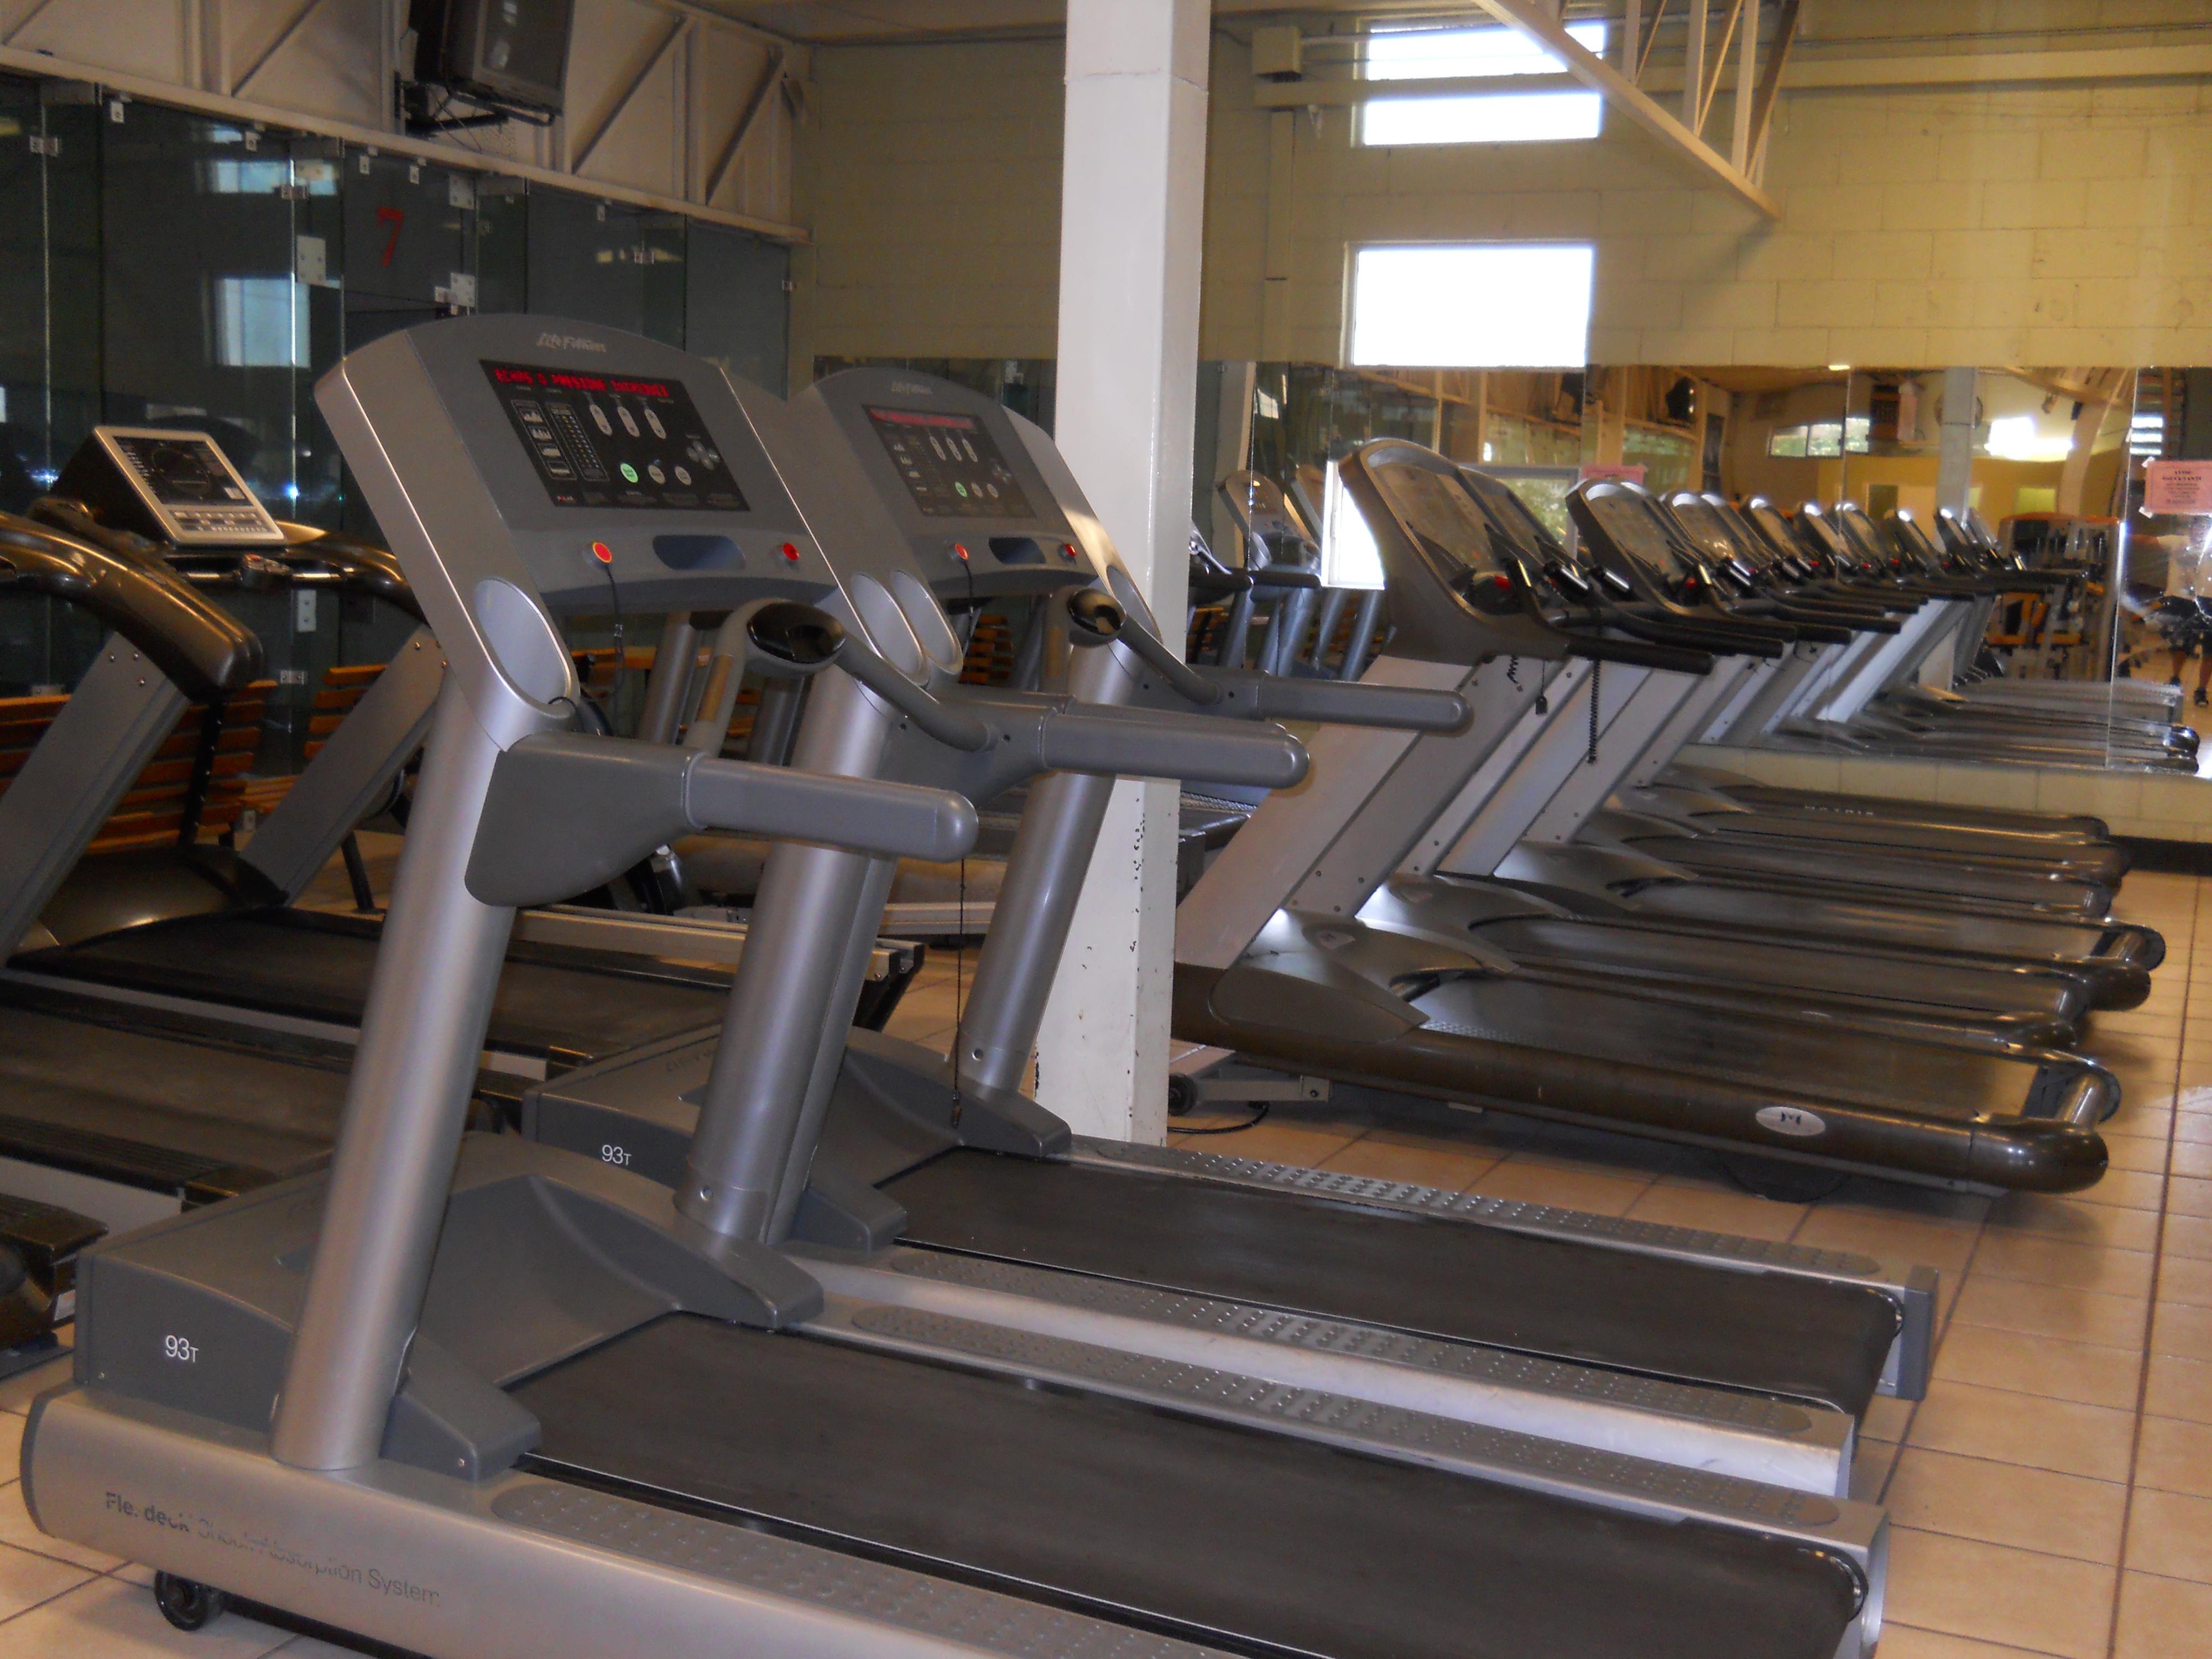 caminadoras-treadmills